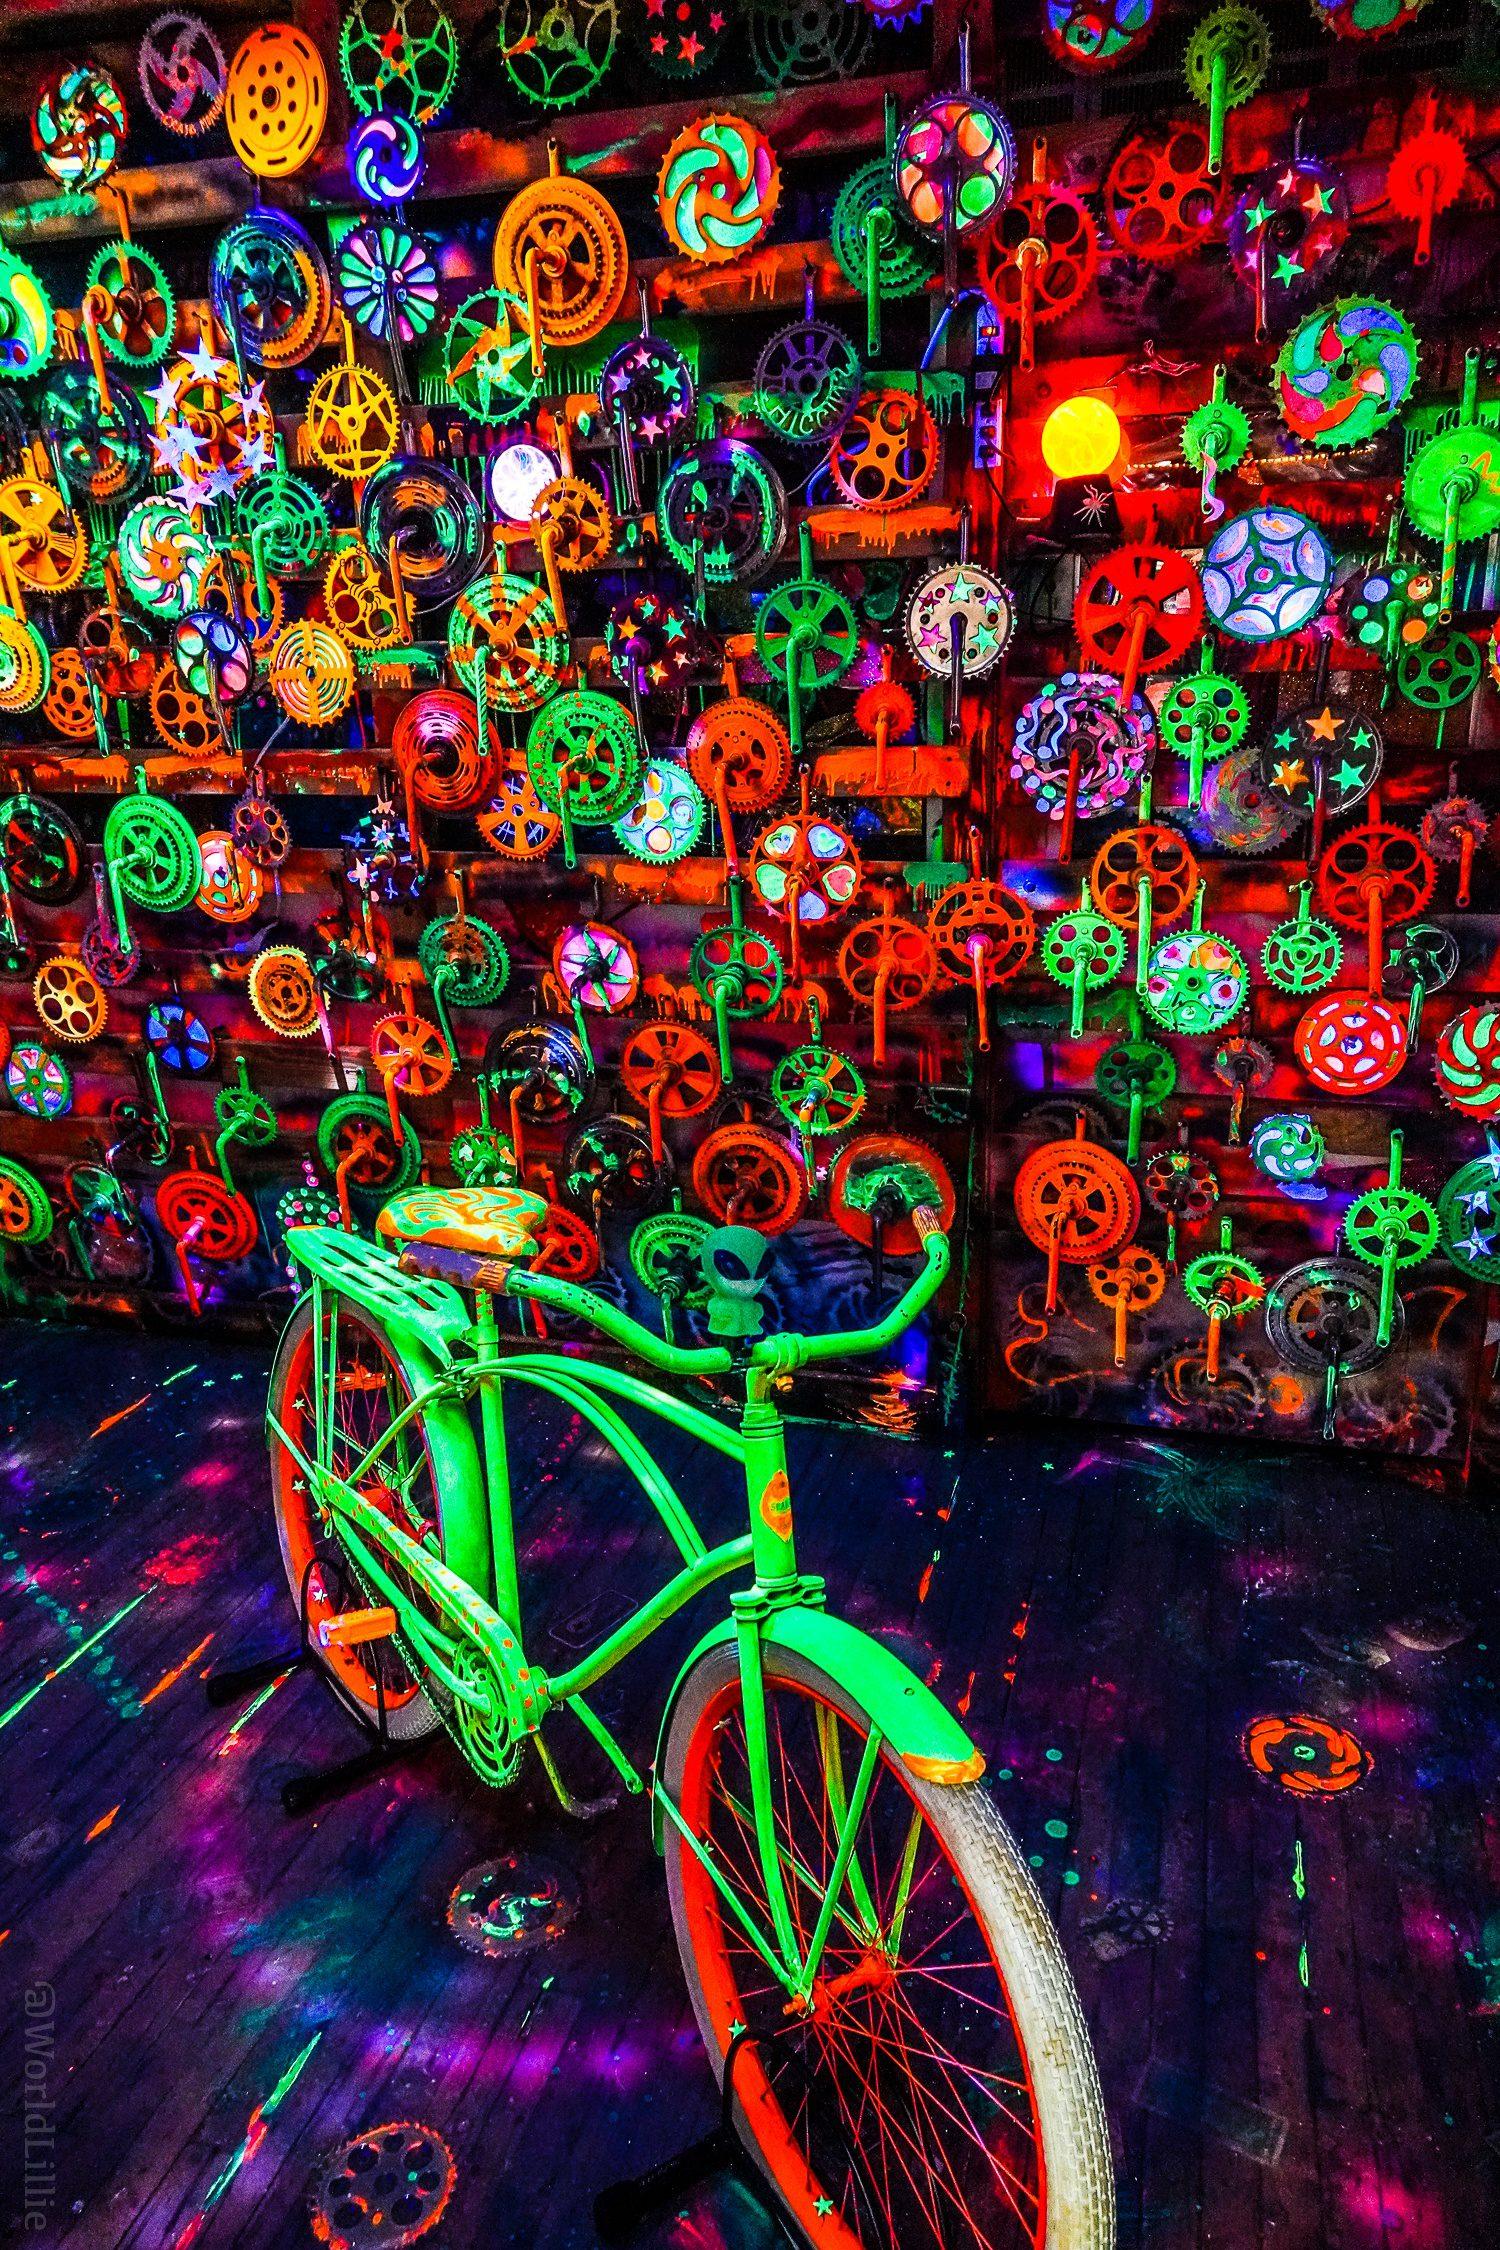 Glow-in-the dark bike room at Bicycle Heaven!